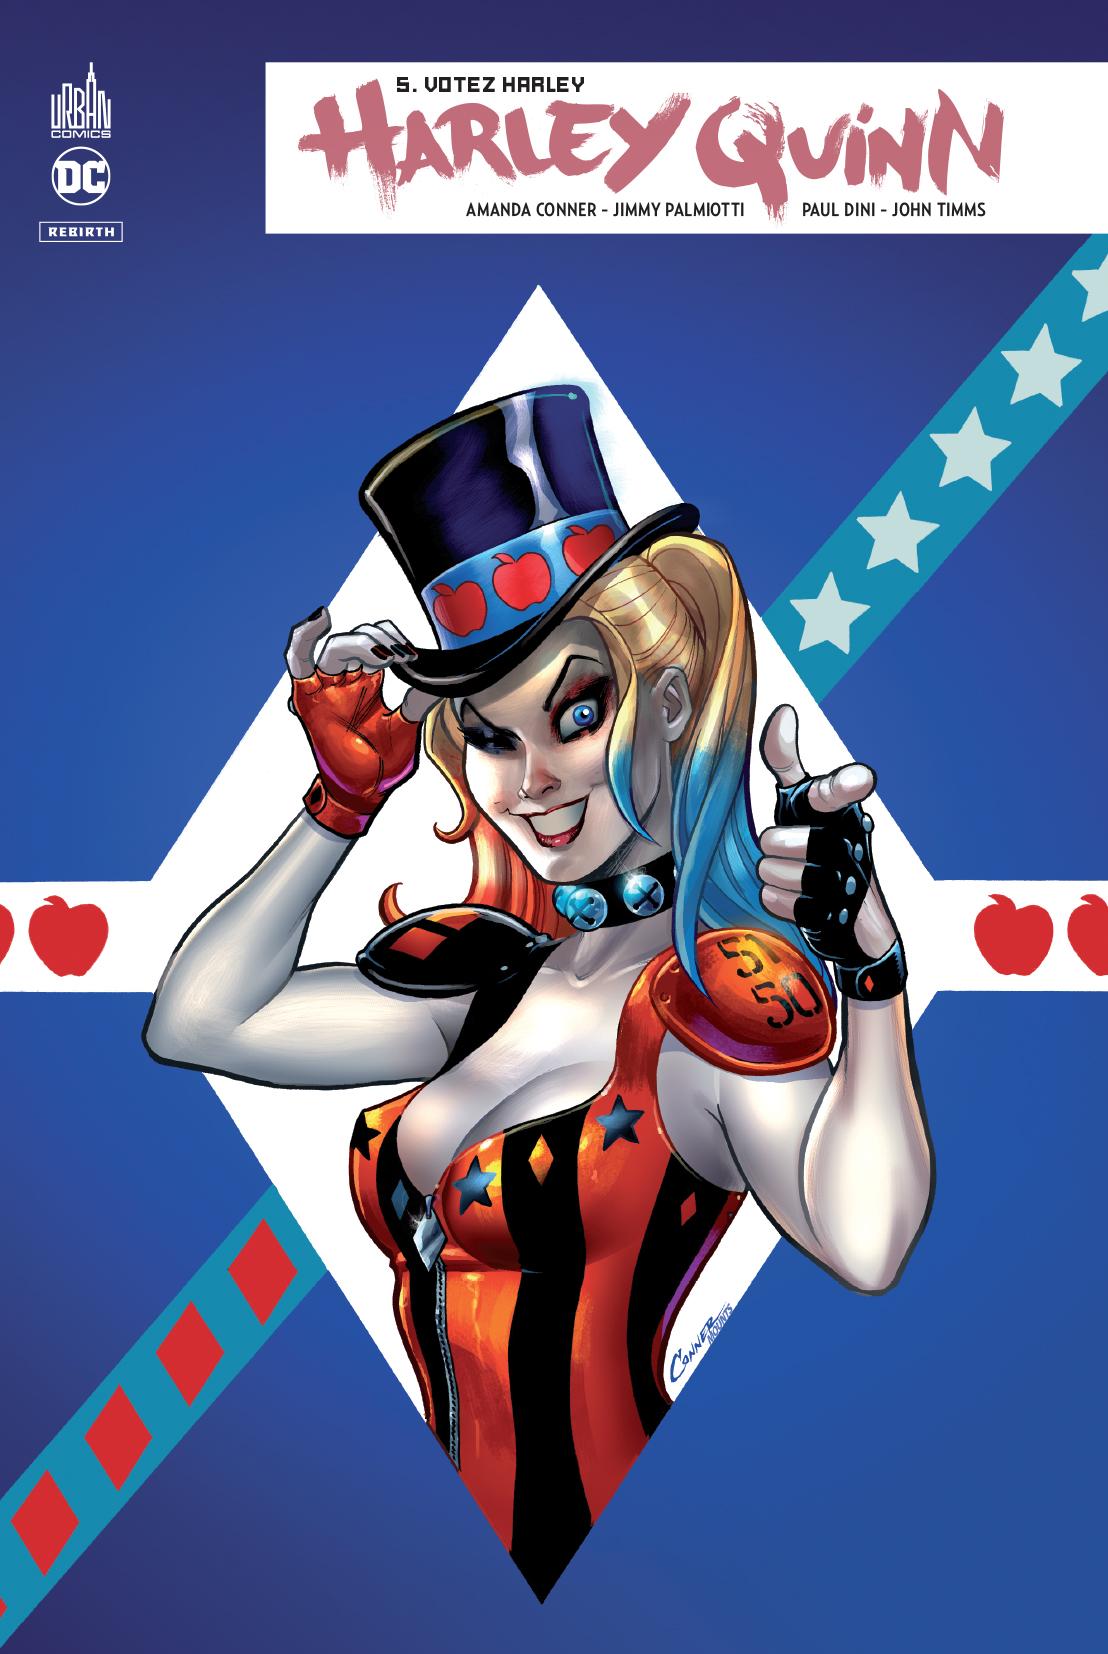 Harley Quinn Rebirth 5 - Votez Harley